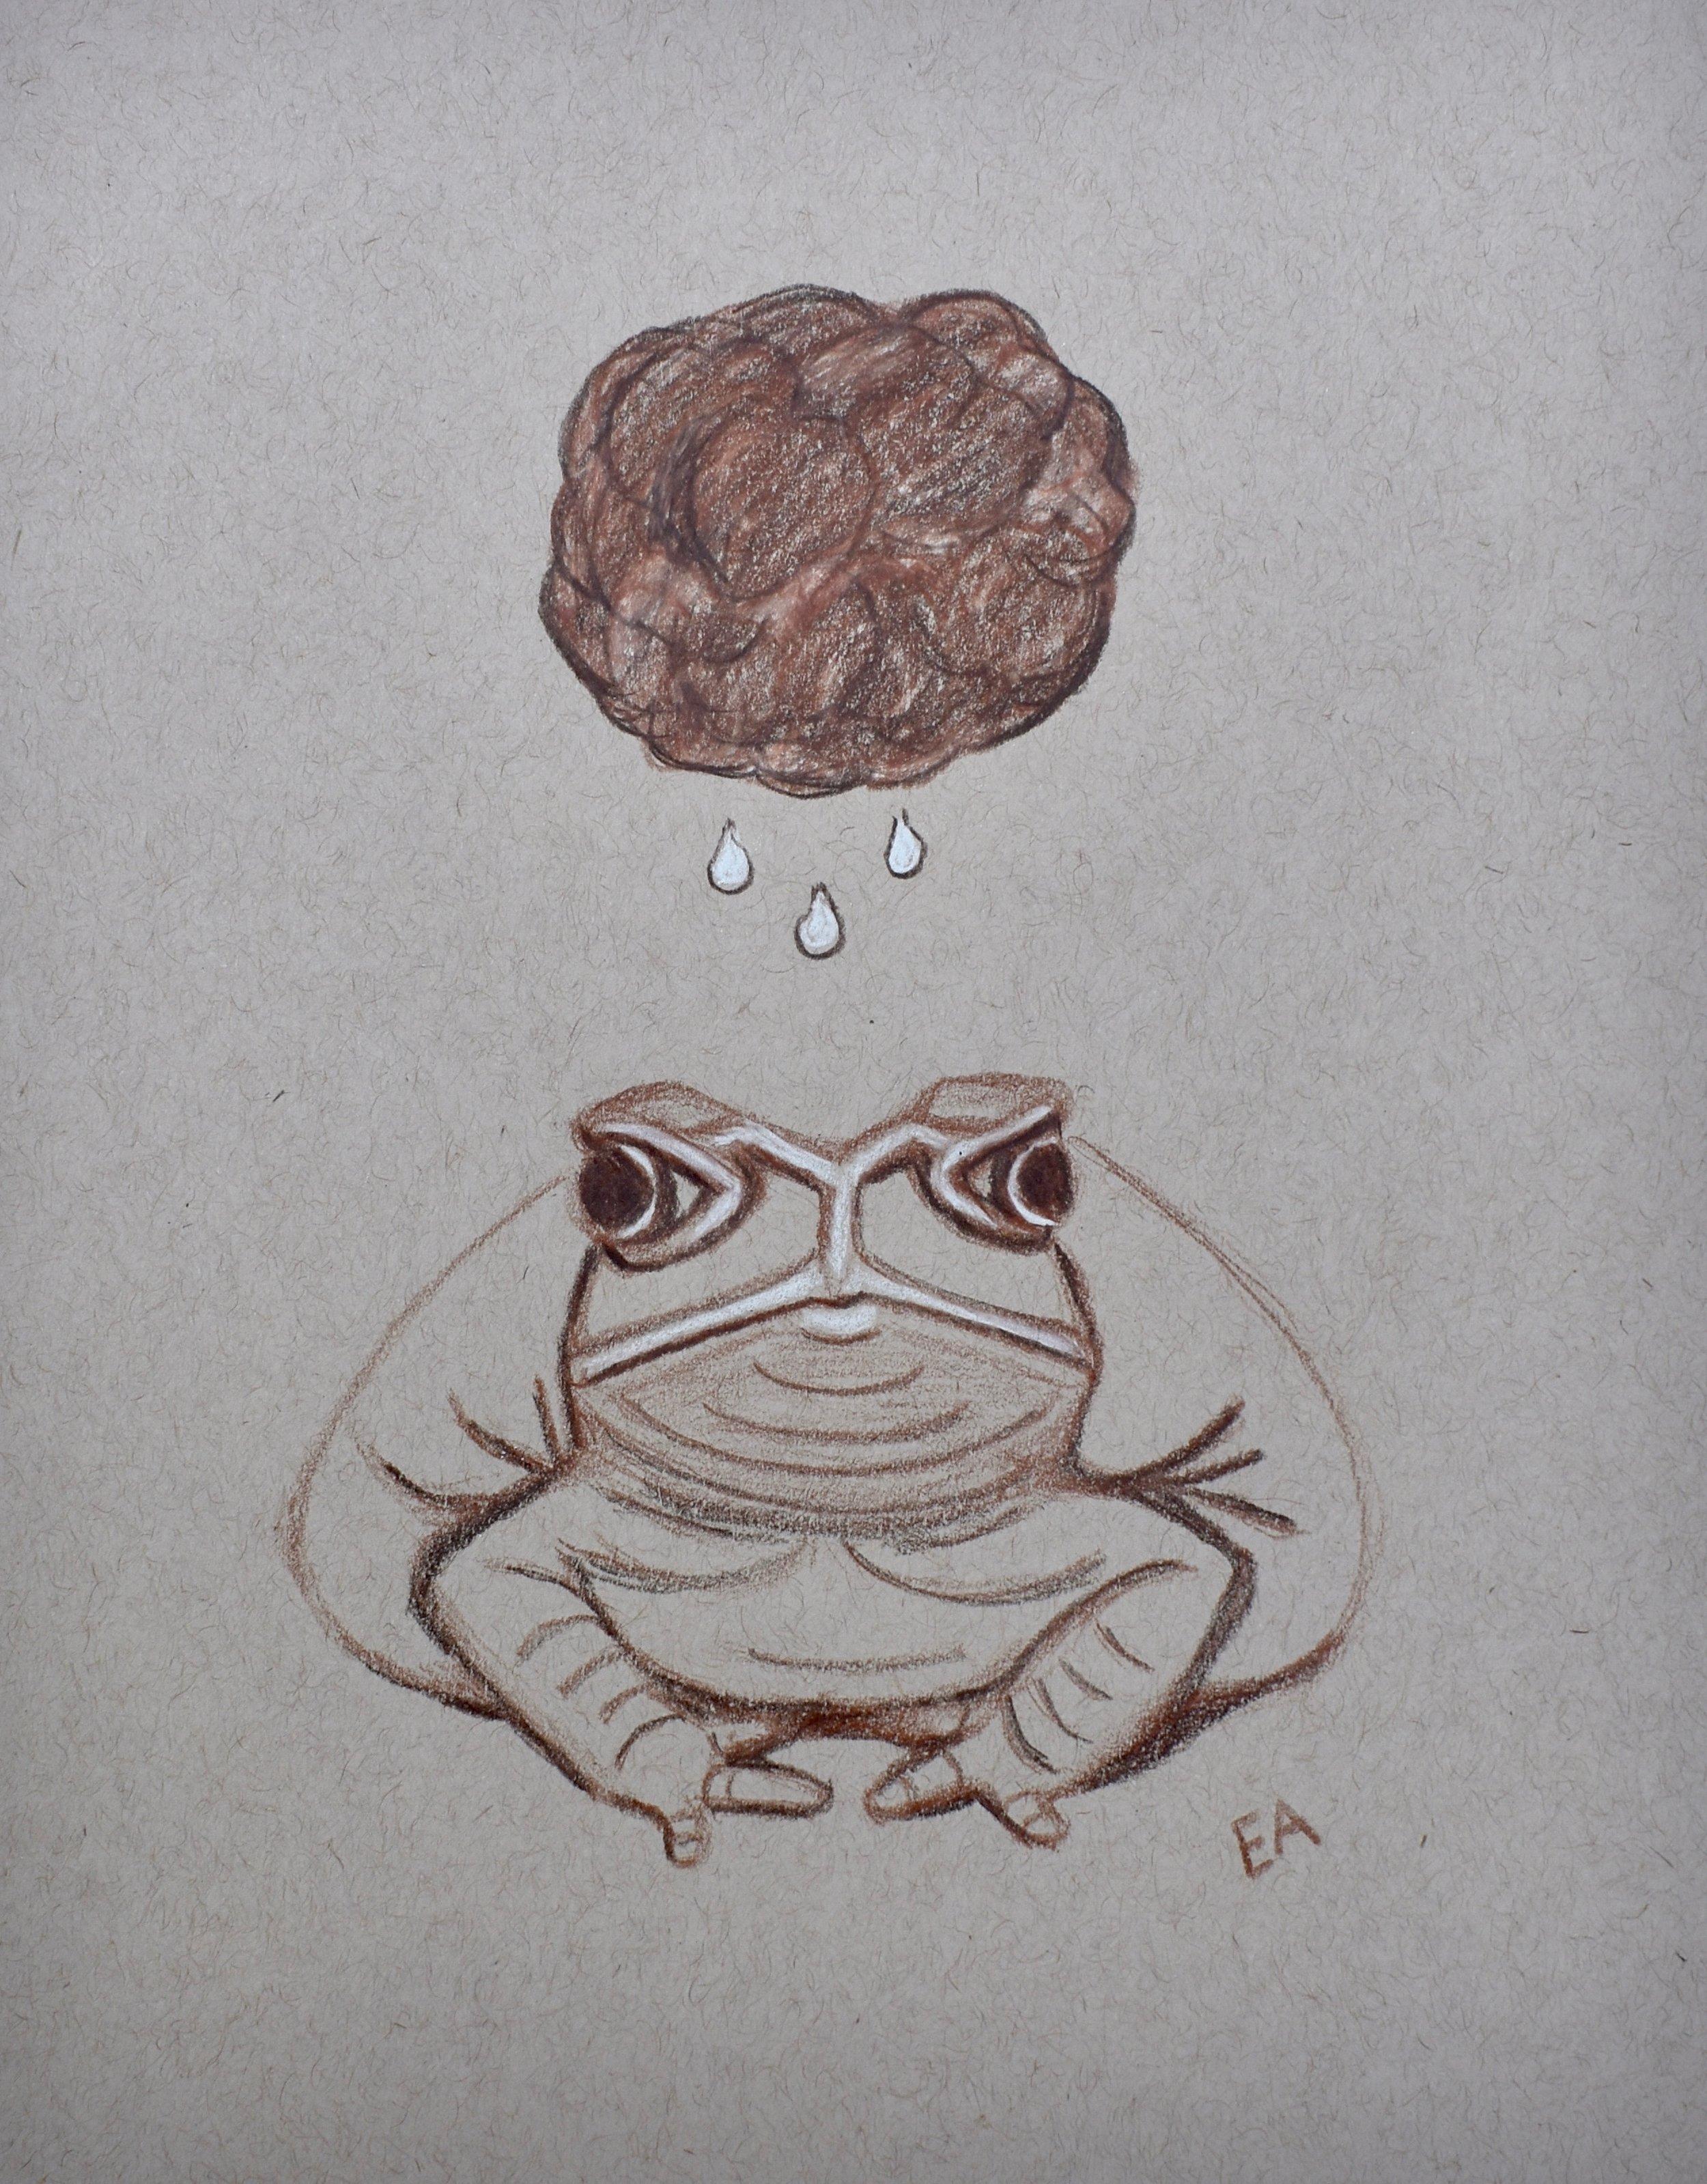 """Grumpy Toad"" 8x10 Prismacolor Pencil on toned paper."